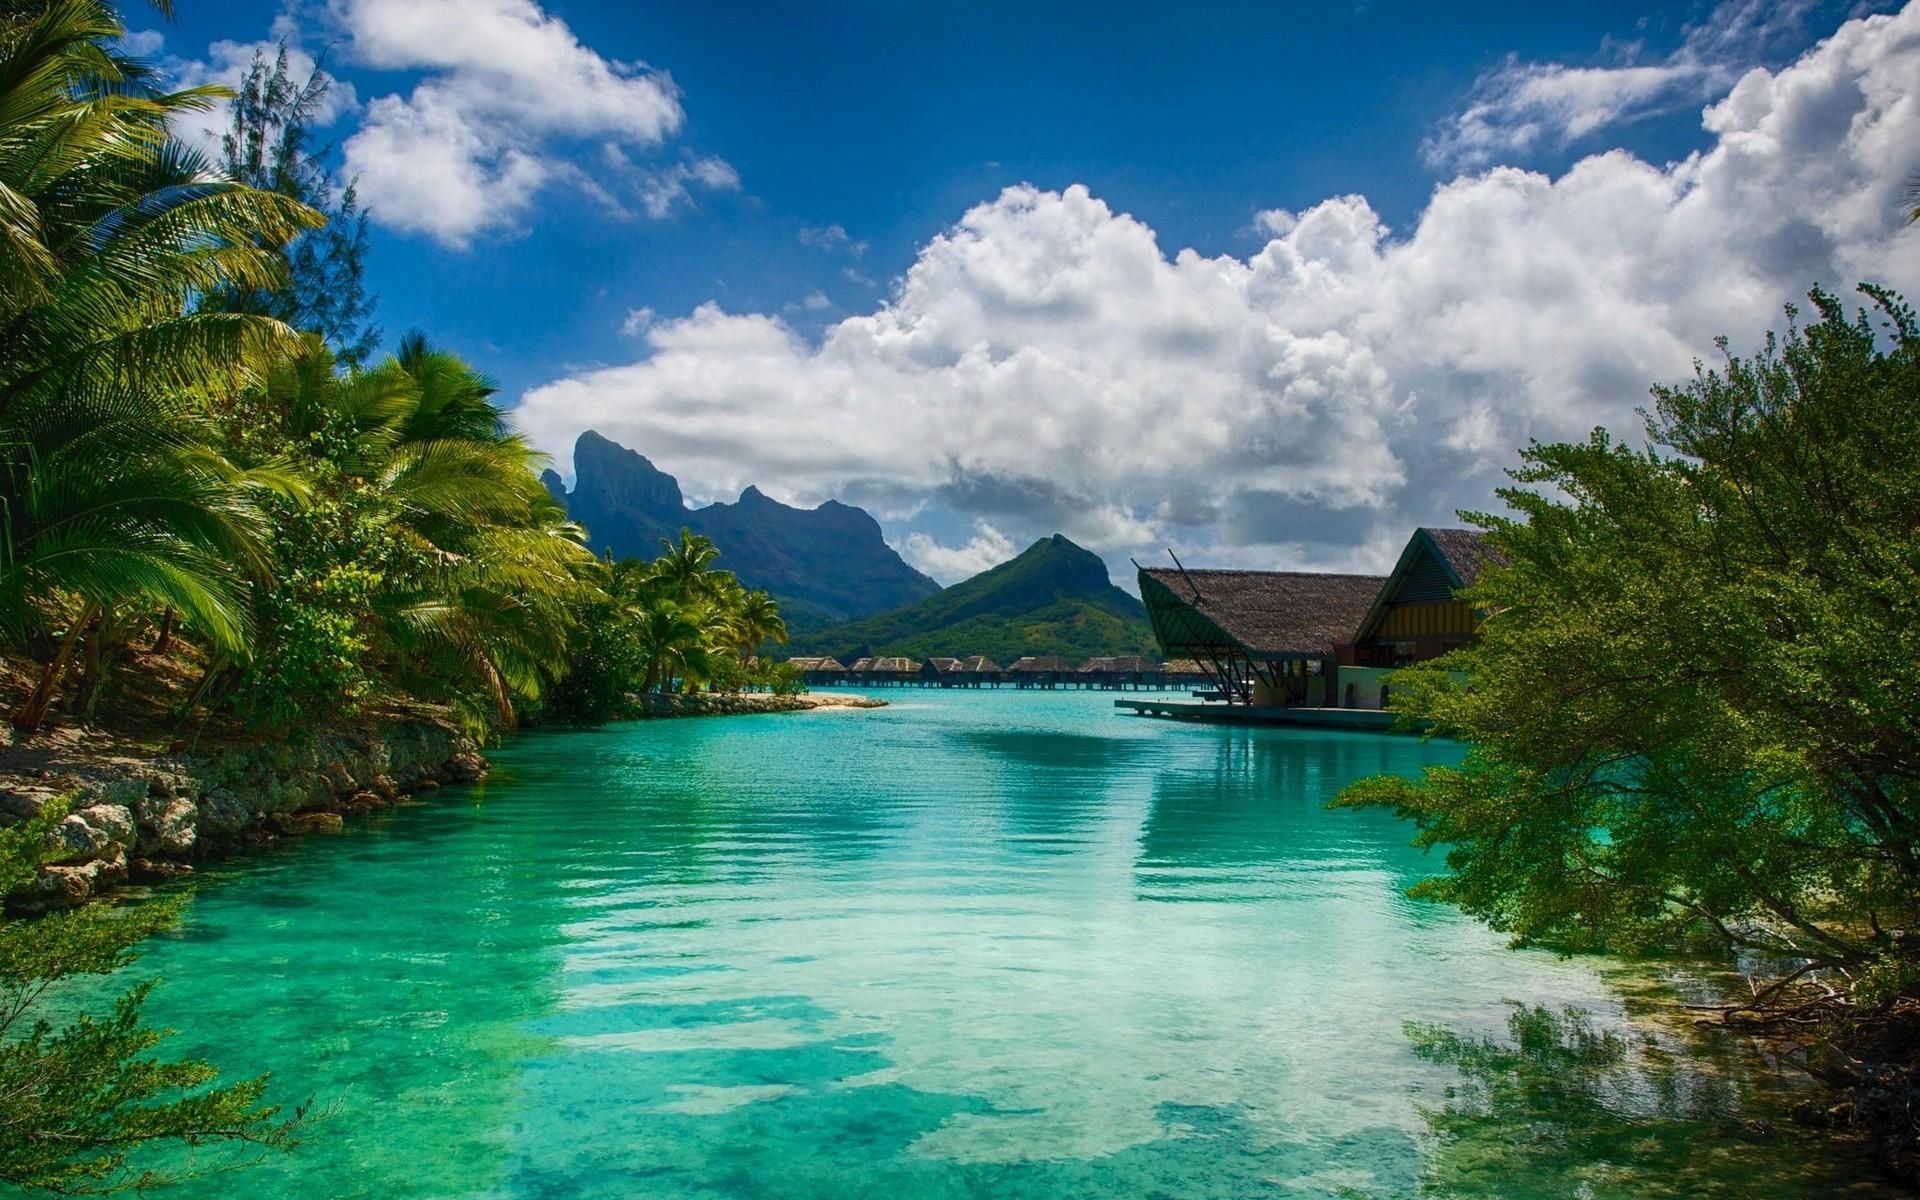 Tropical Resort Fond d'écran HD | Arrière-Plan | 1920x1200 | ID:778277 - Wallpaper Abyss